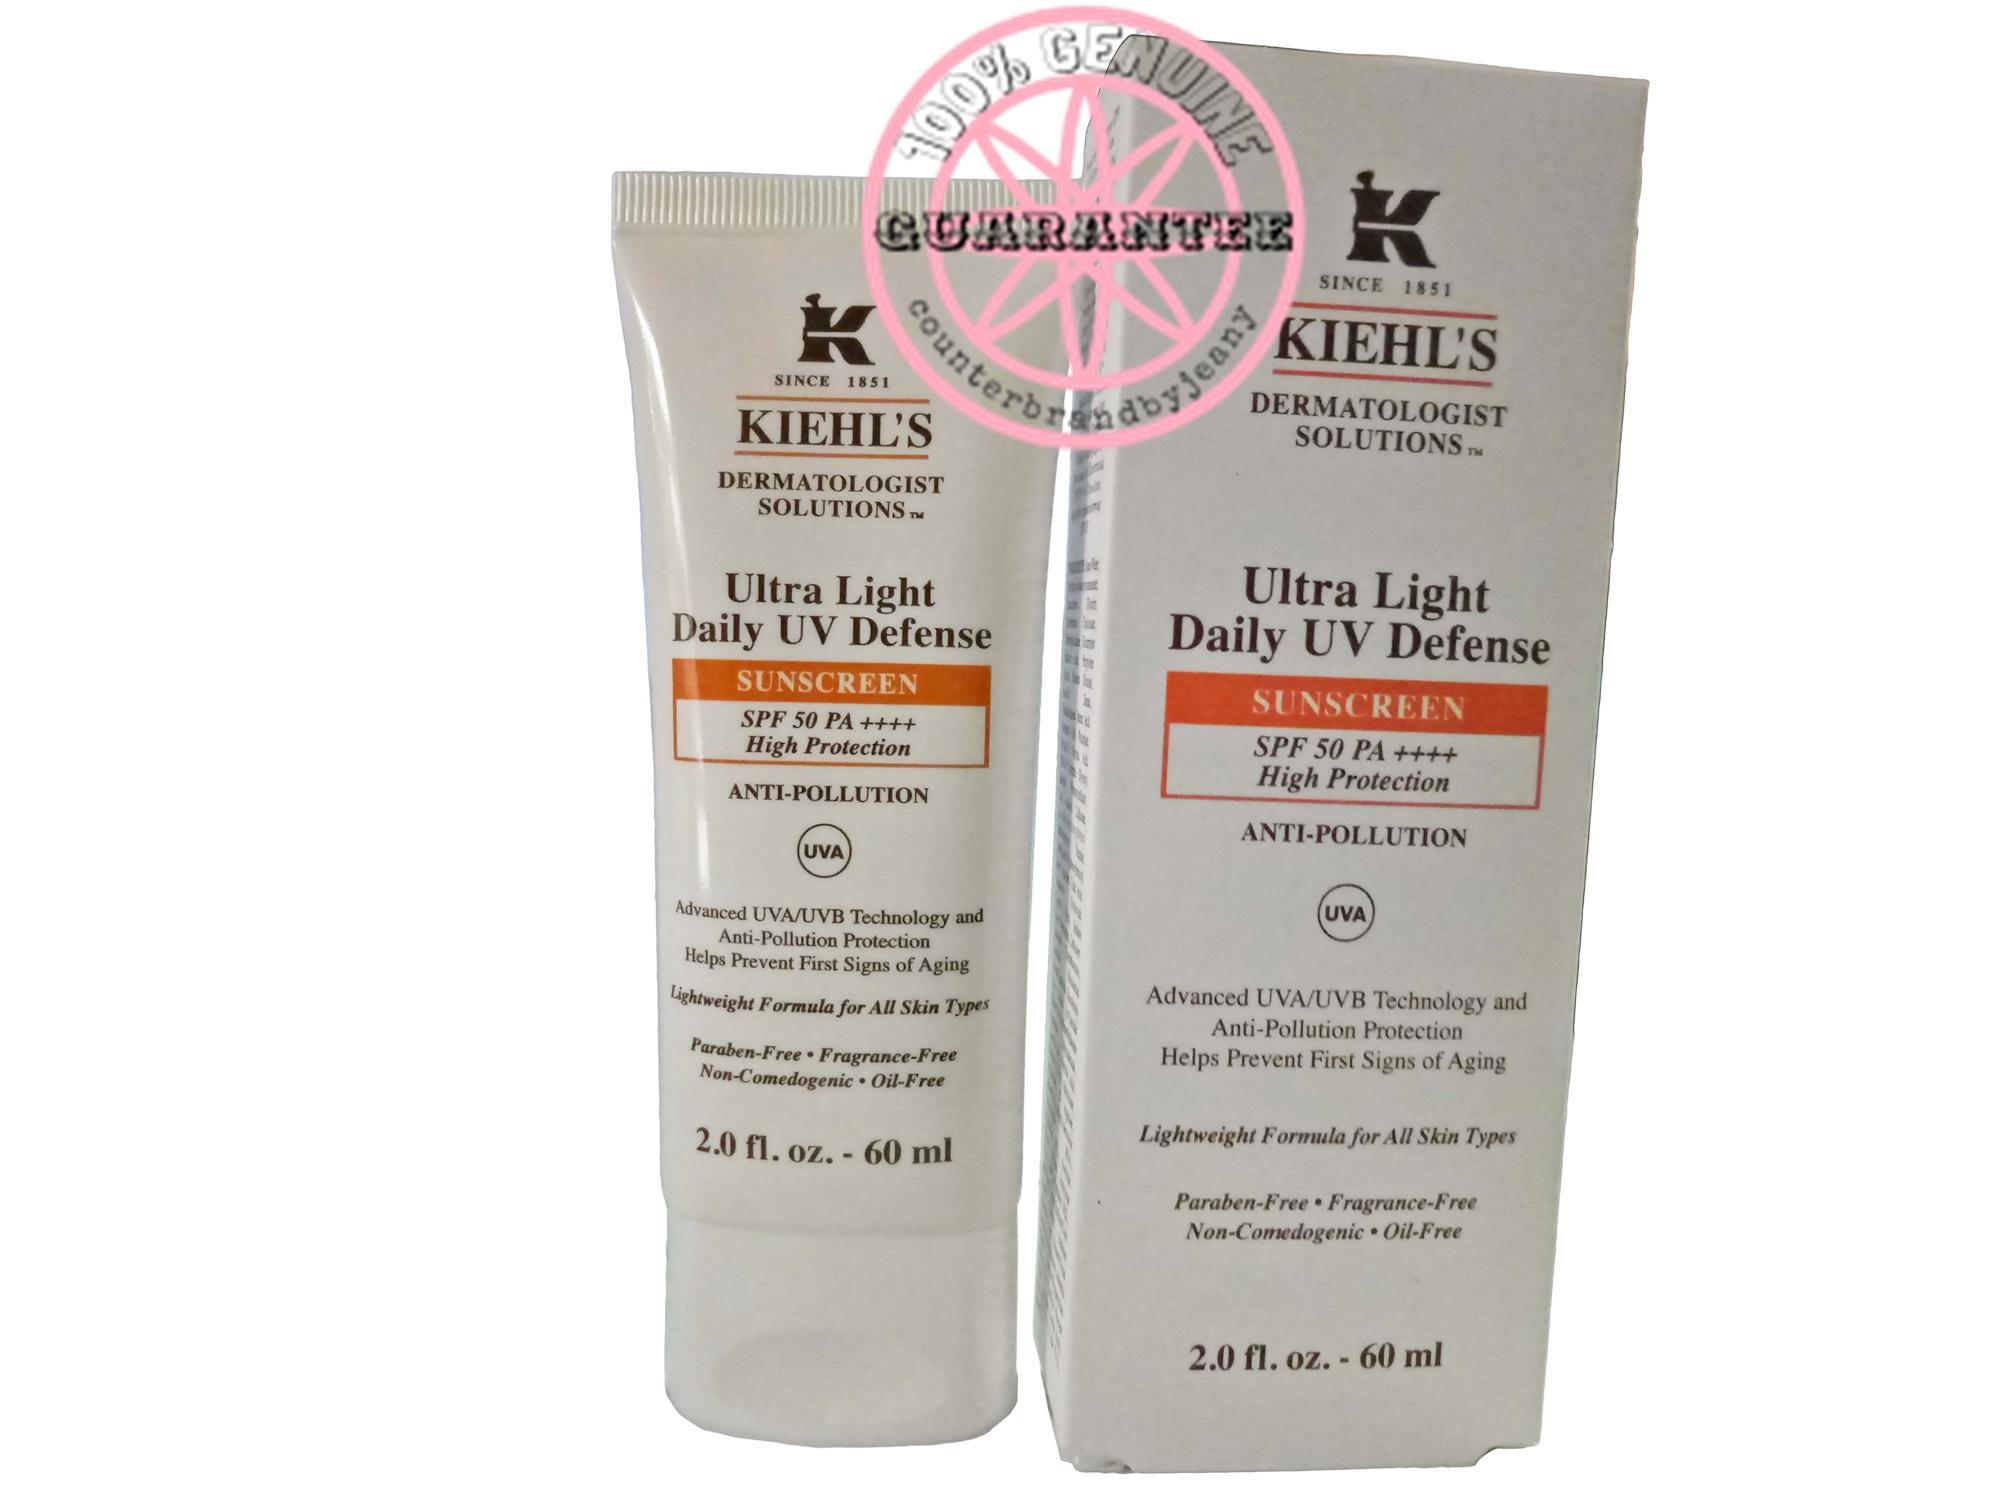 KIEHL'S Ultra Light Daily UV Defense Sunscreen SPF50 PA++++